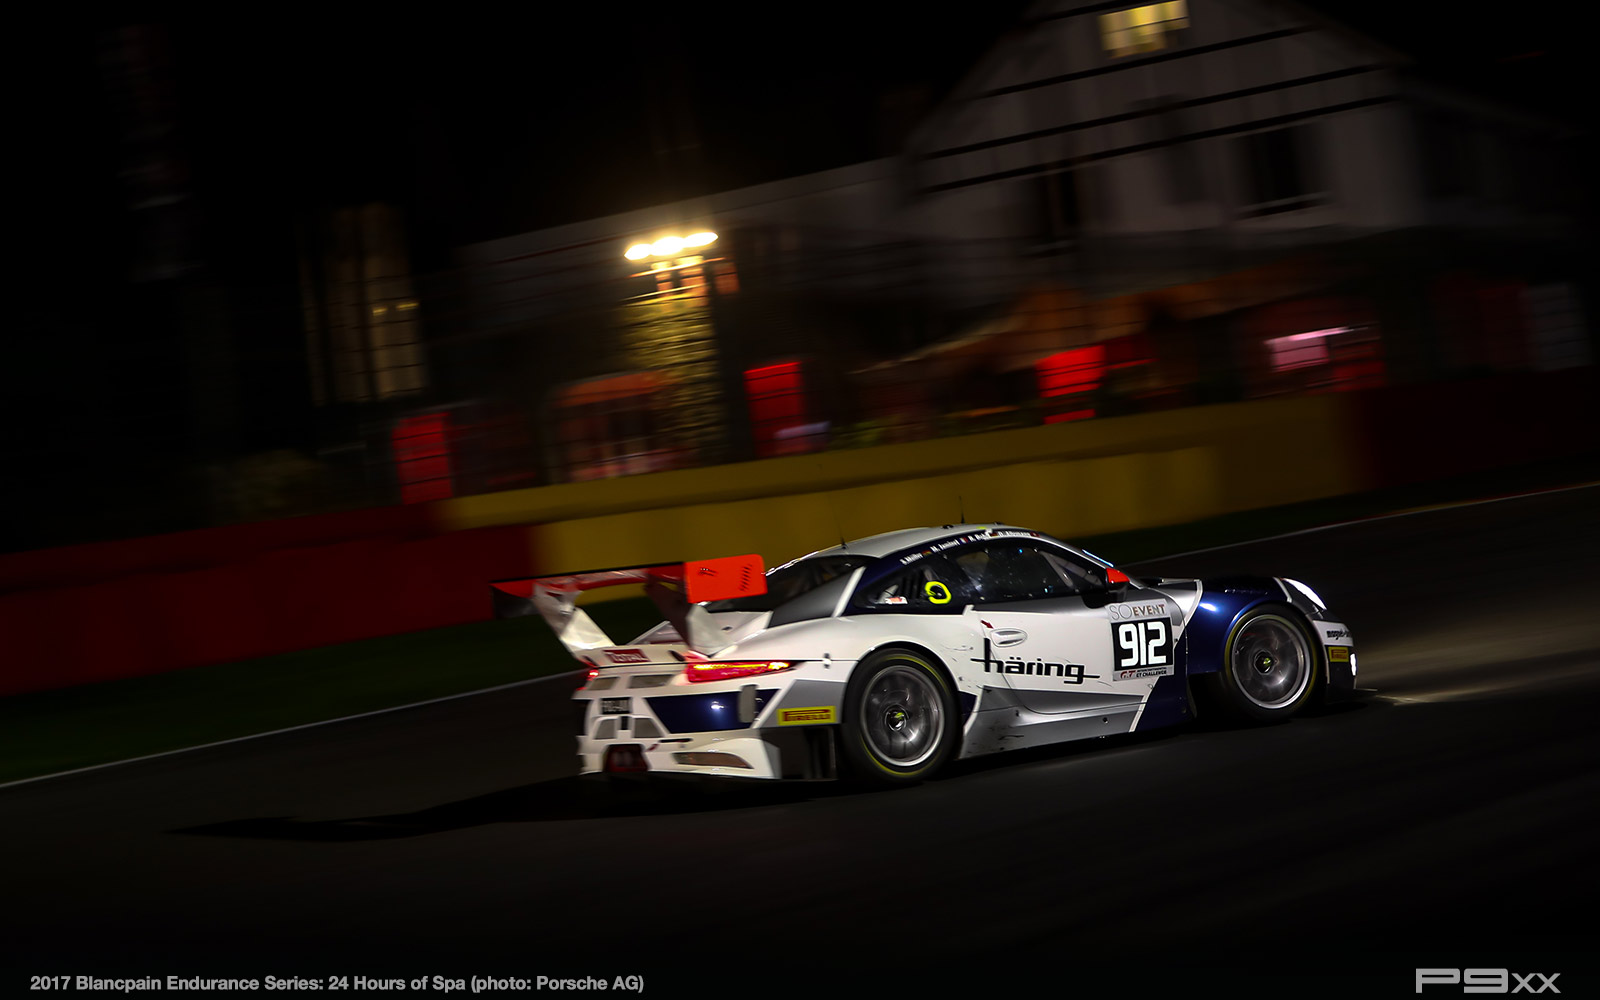 2017-24-Hours-of-Spa-Porsche-327